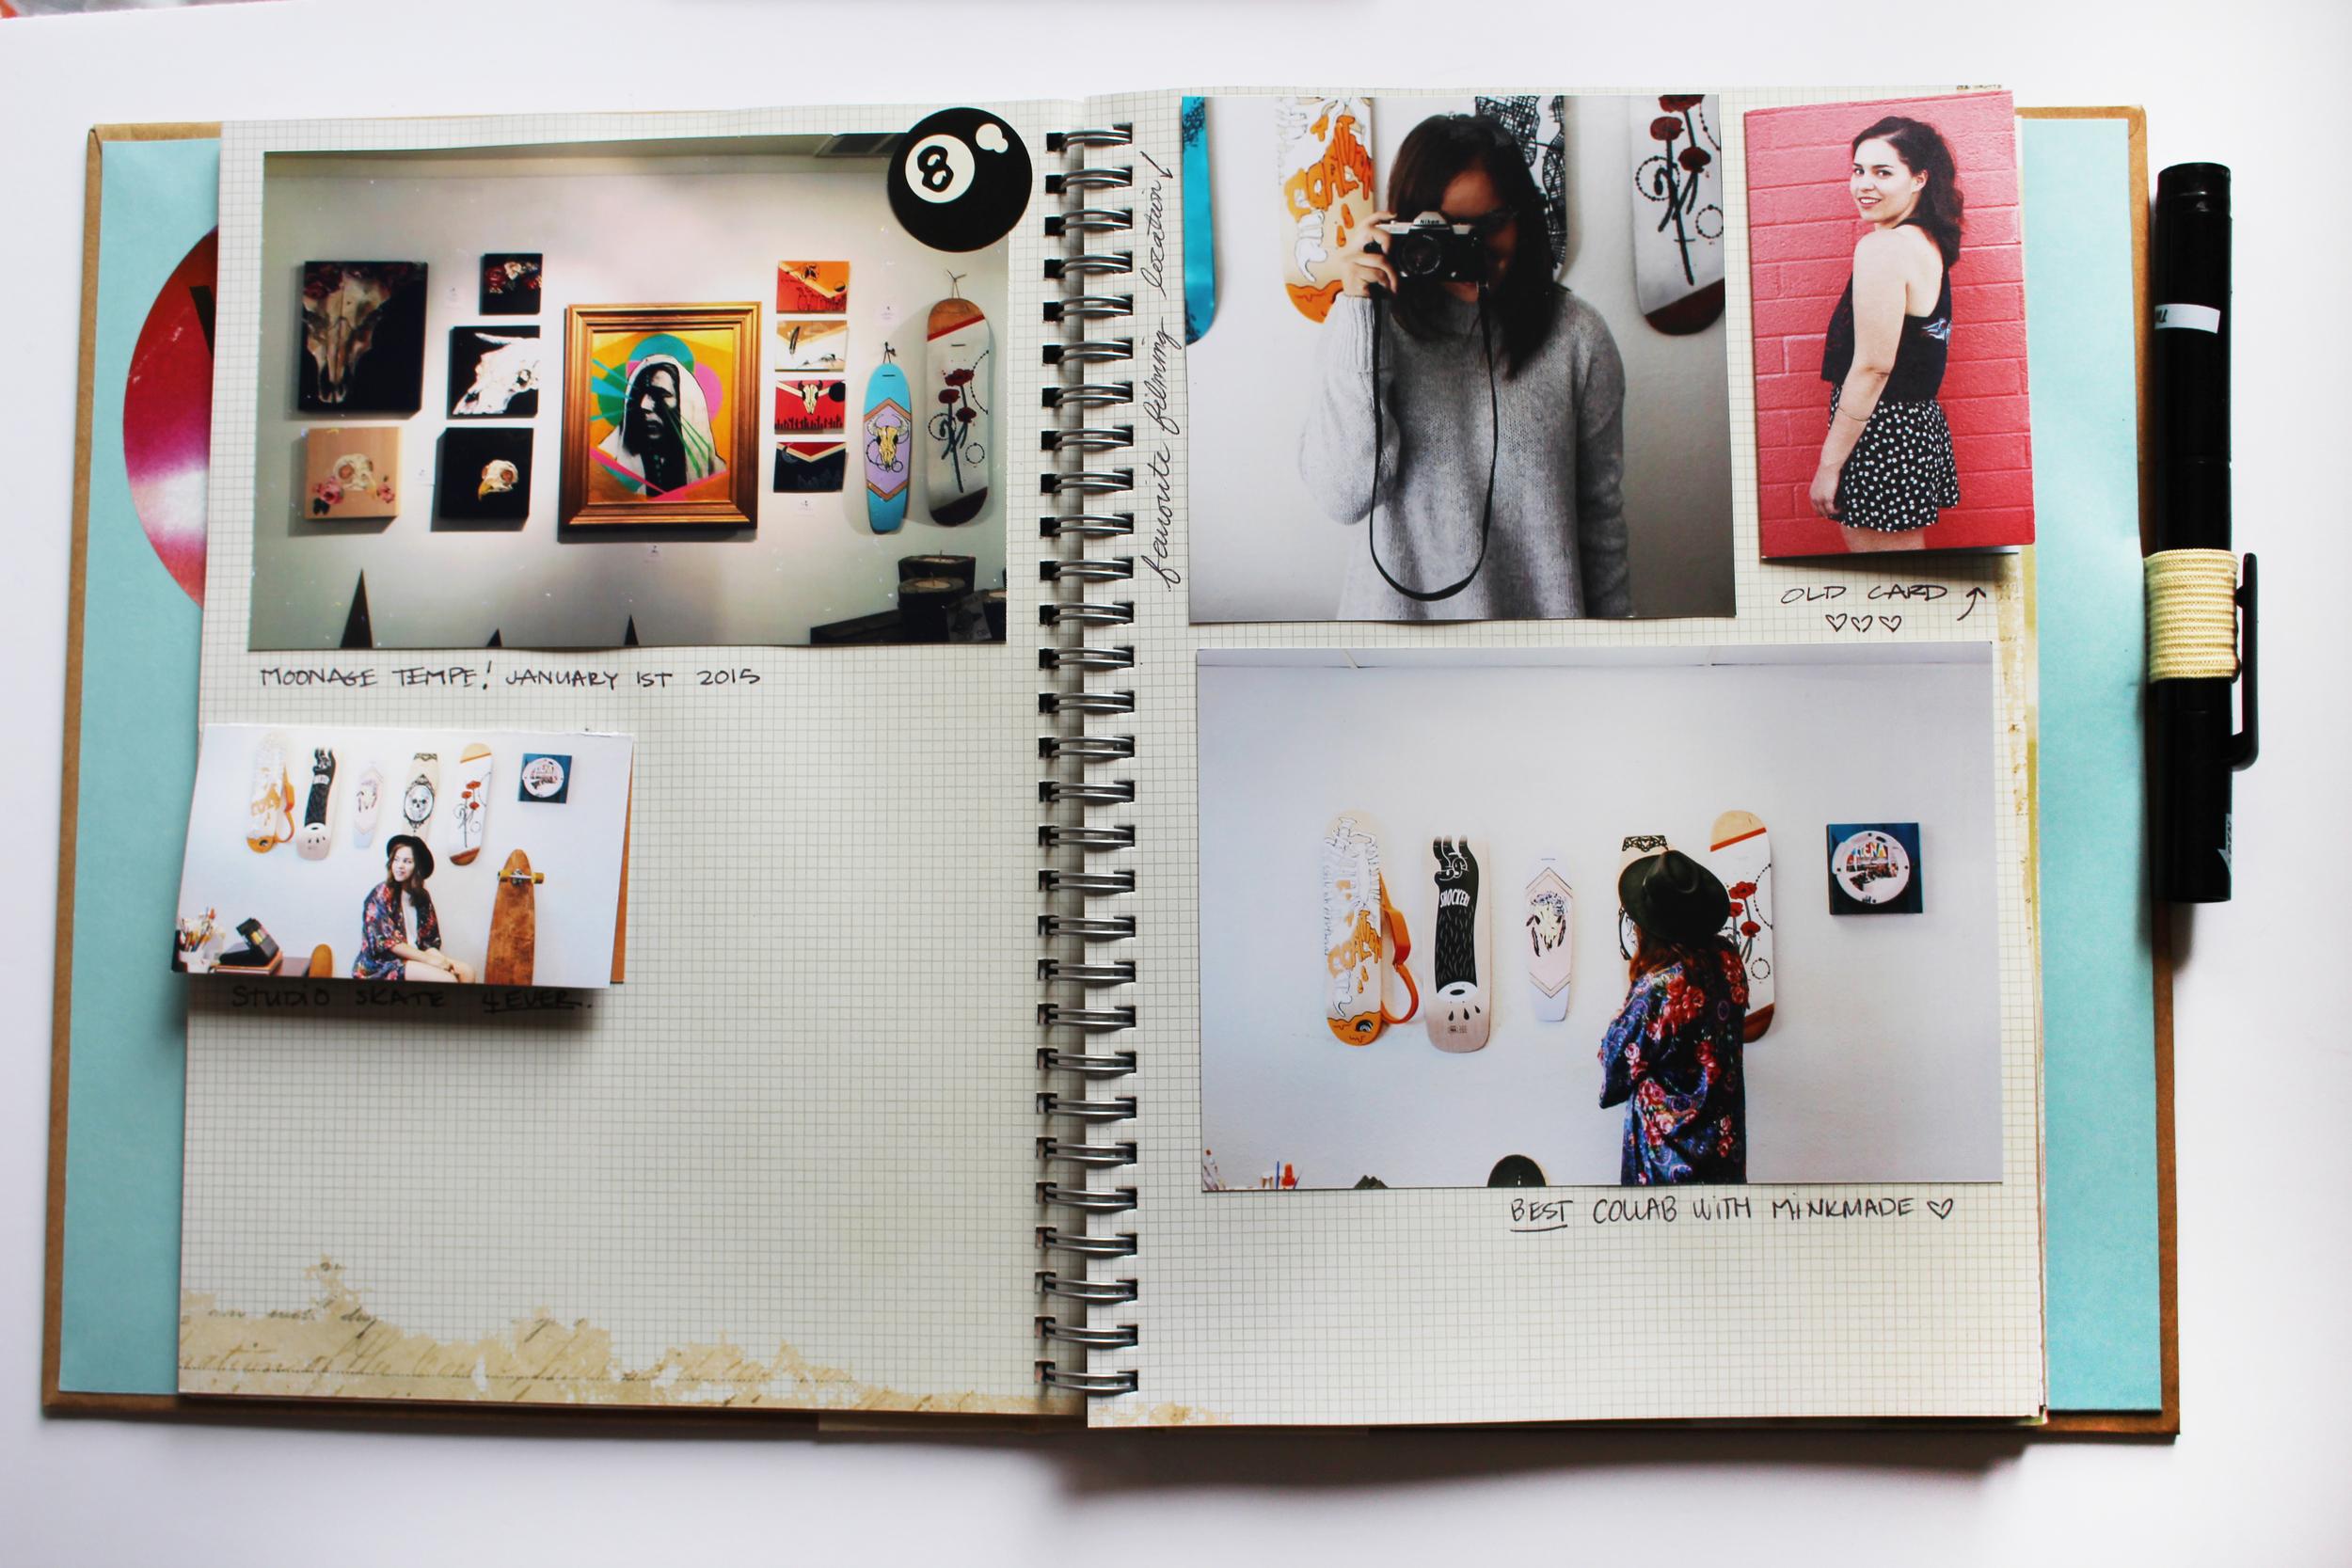 Bottom right photo by  Minkmade